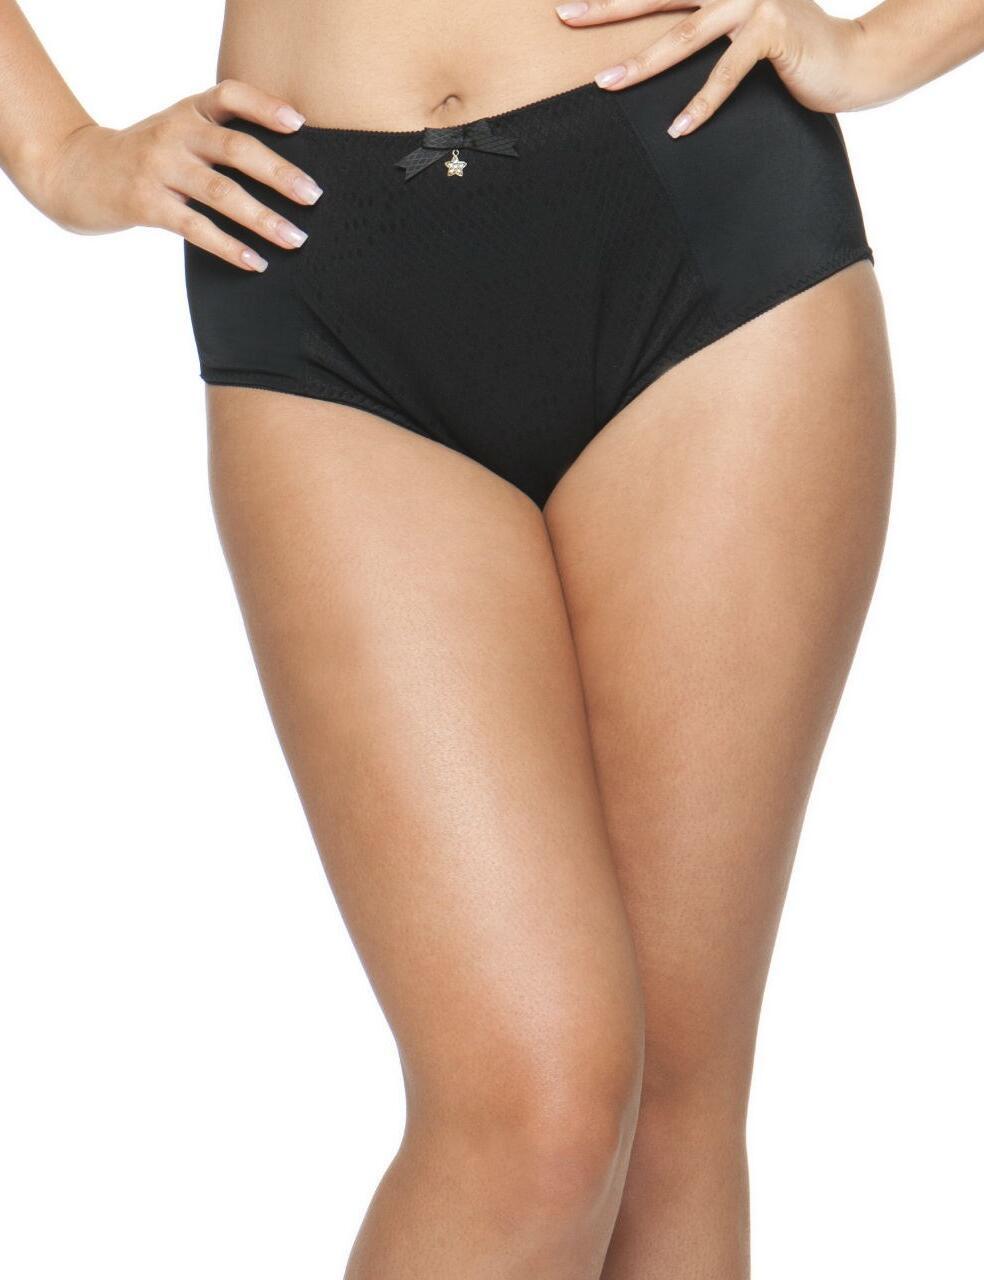 Curvy Kate Smoothie: shaper brief 50% off - Black